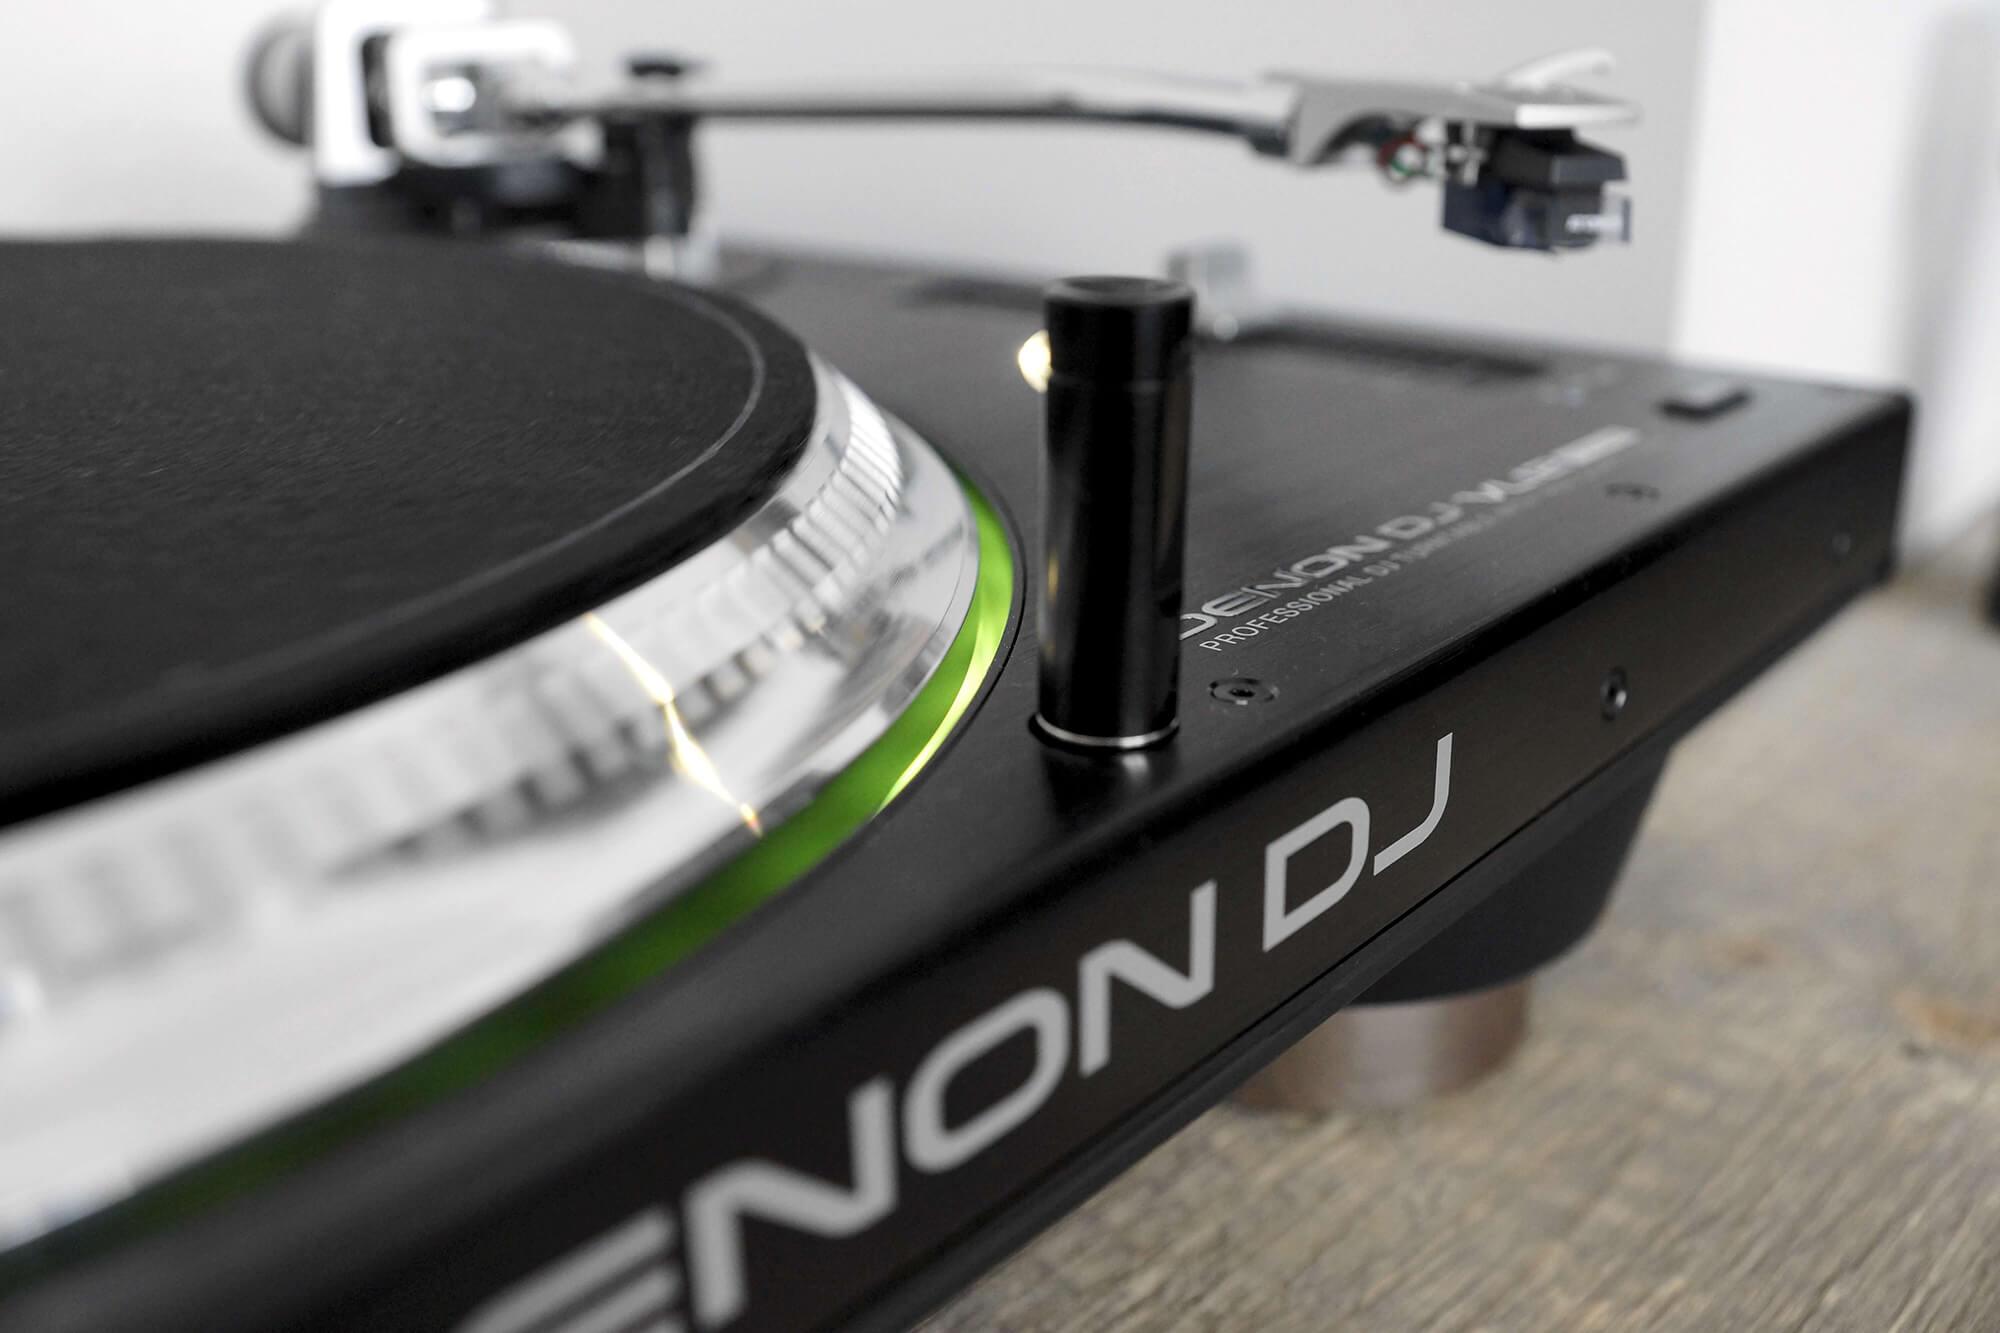 Sonos Vinyl: Denon DJ VL12 Prime Test 2 techboys.de • smarte News, auf den Punkt! Sonos Vinyl: Denon DJ VL12 Prime Test